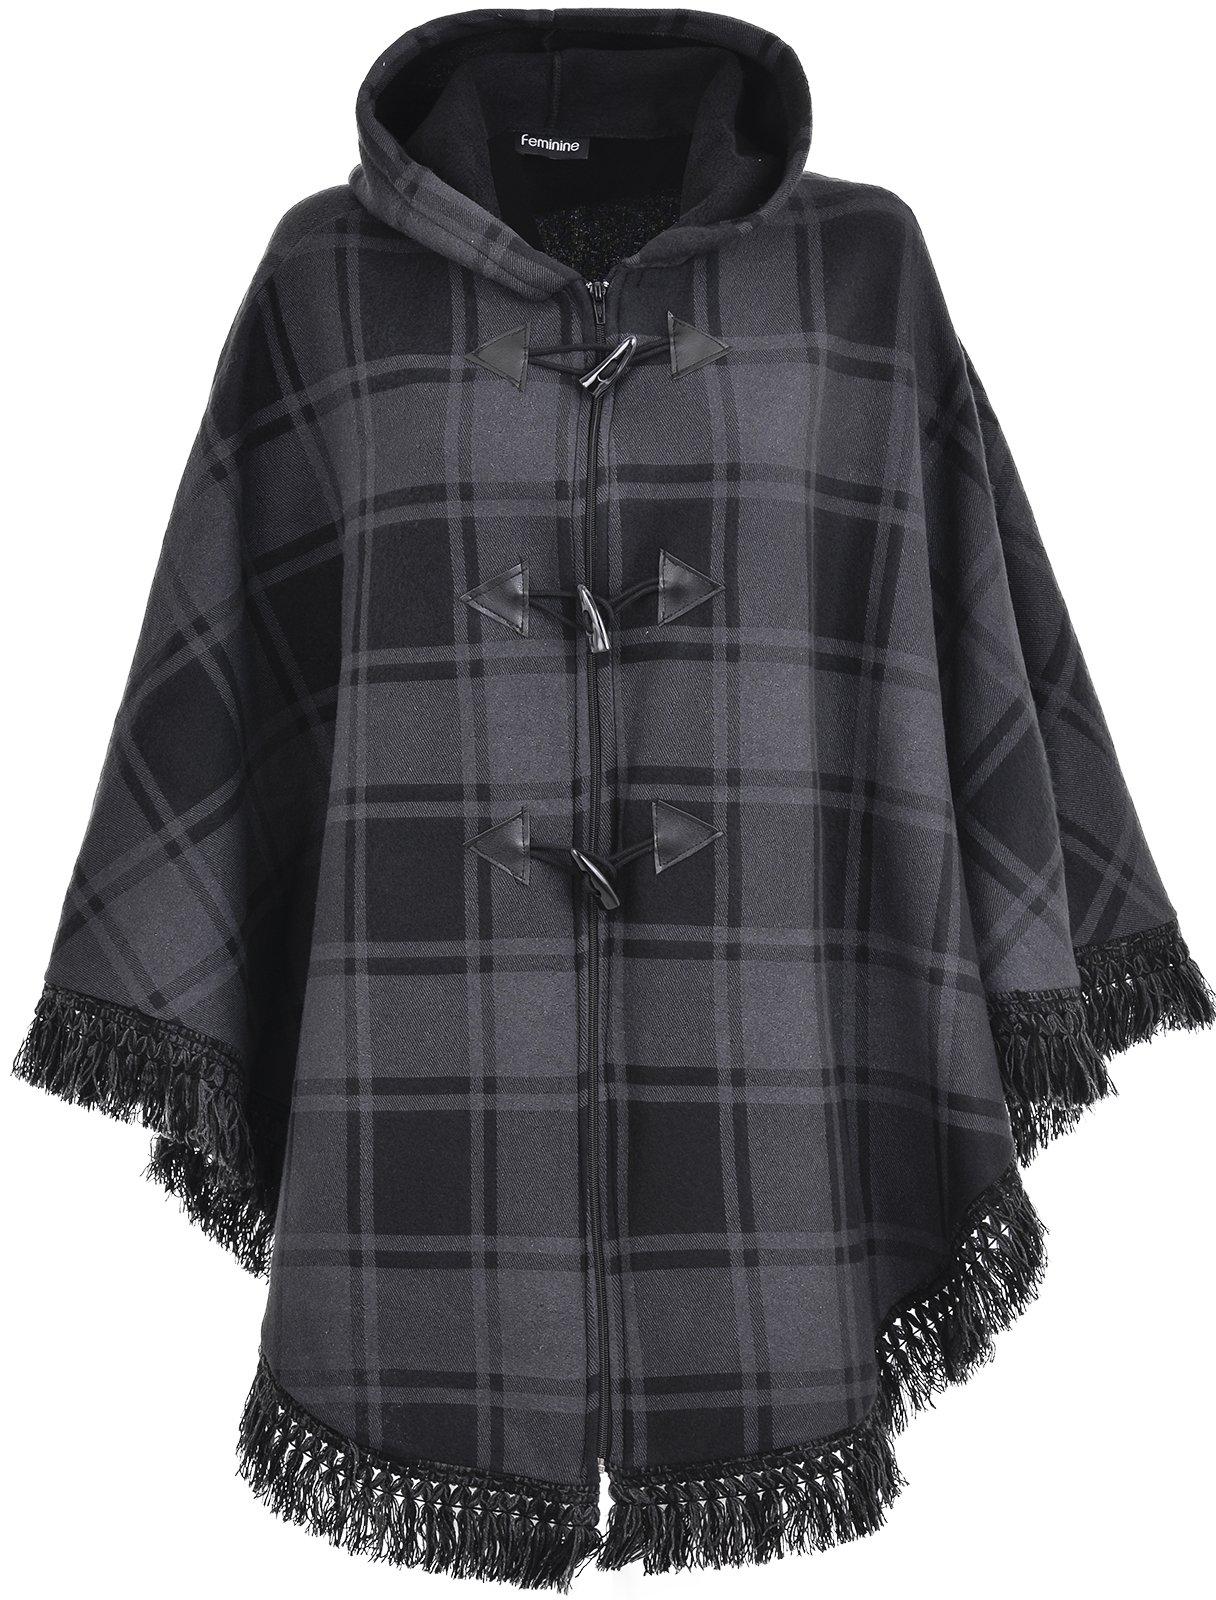 RG Clothing Ladies Women Warm Fleece Fleecy Hooded Ponchos